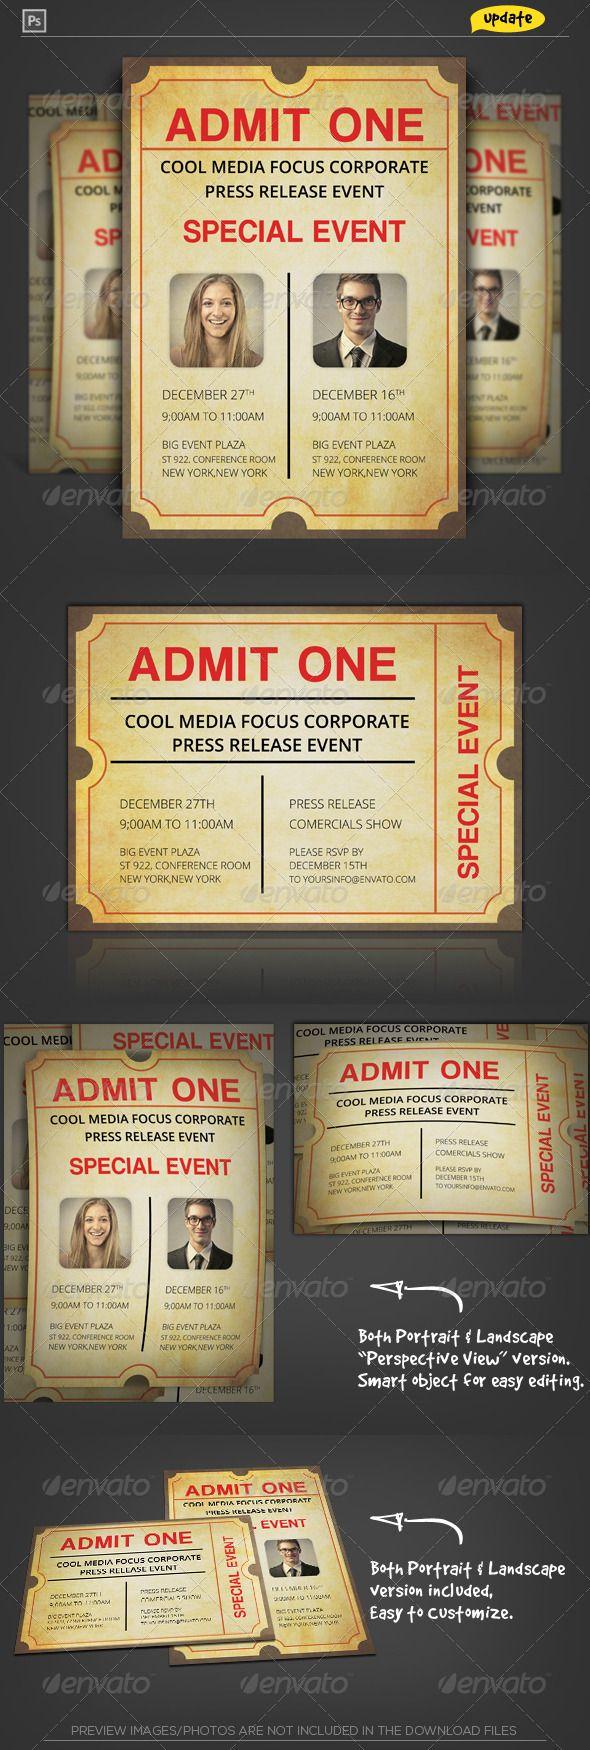 Admit One Ticket Corporate Invitation 144 best